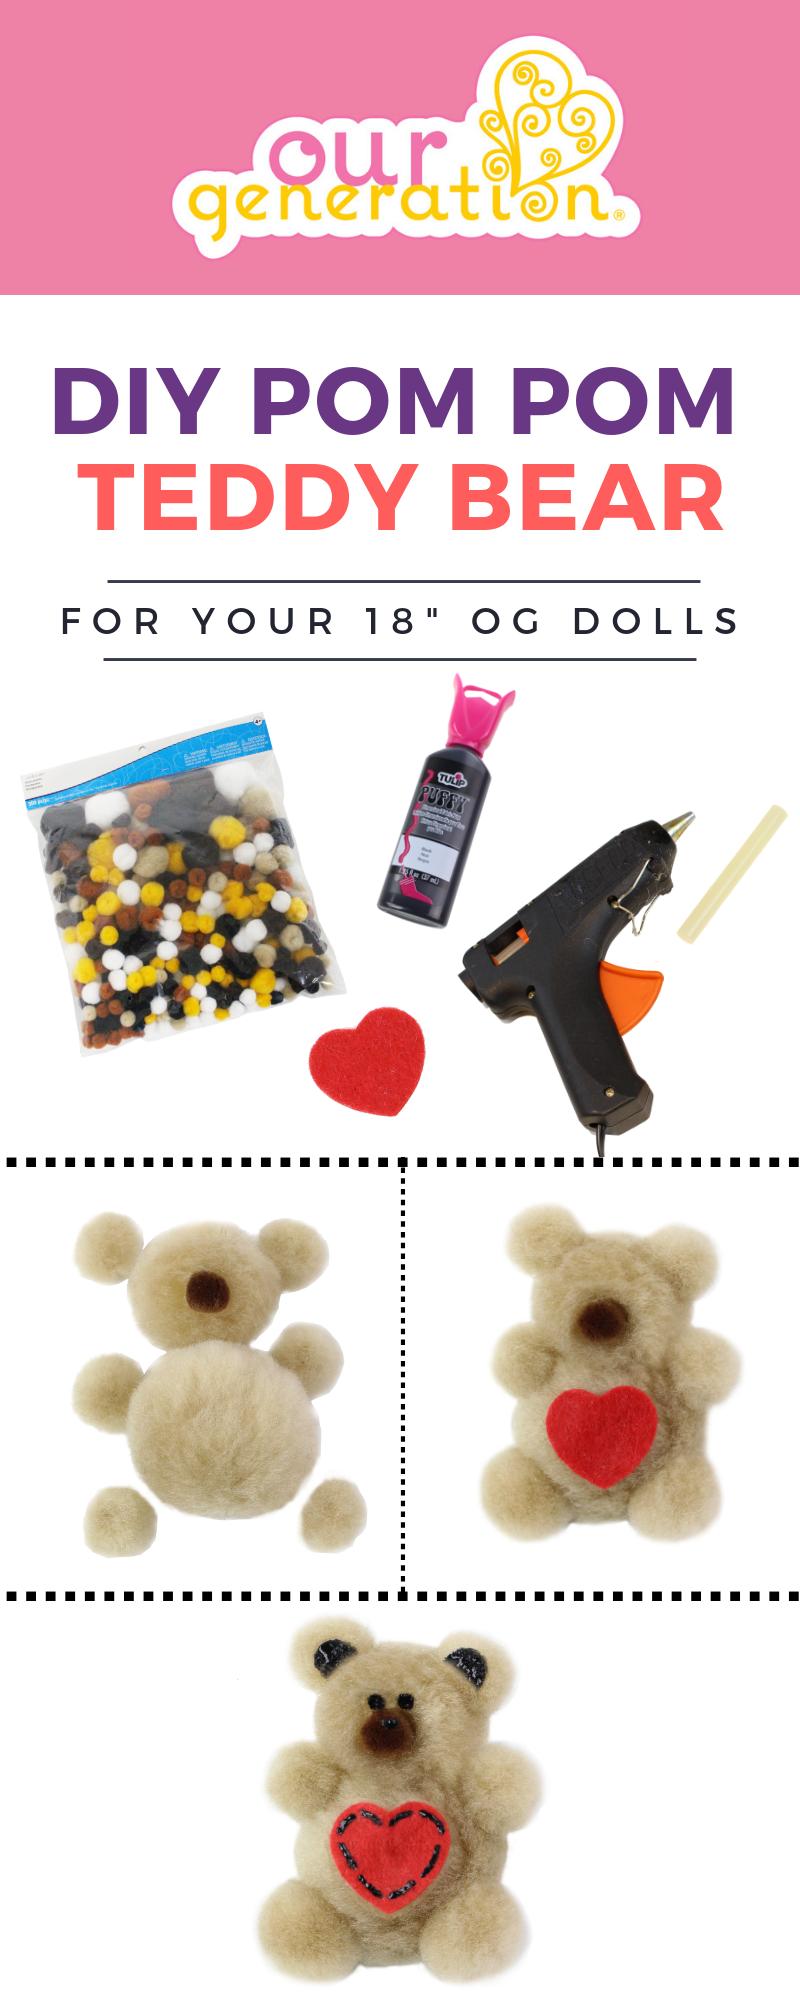 Infographic for making DIY Pom Pom Teddy Bears